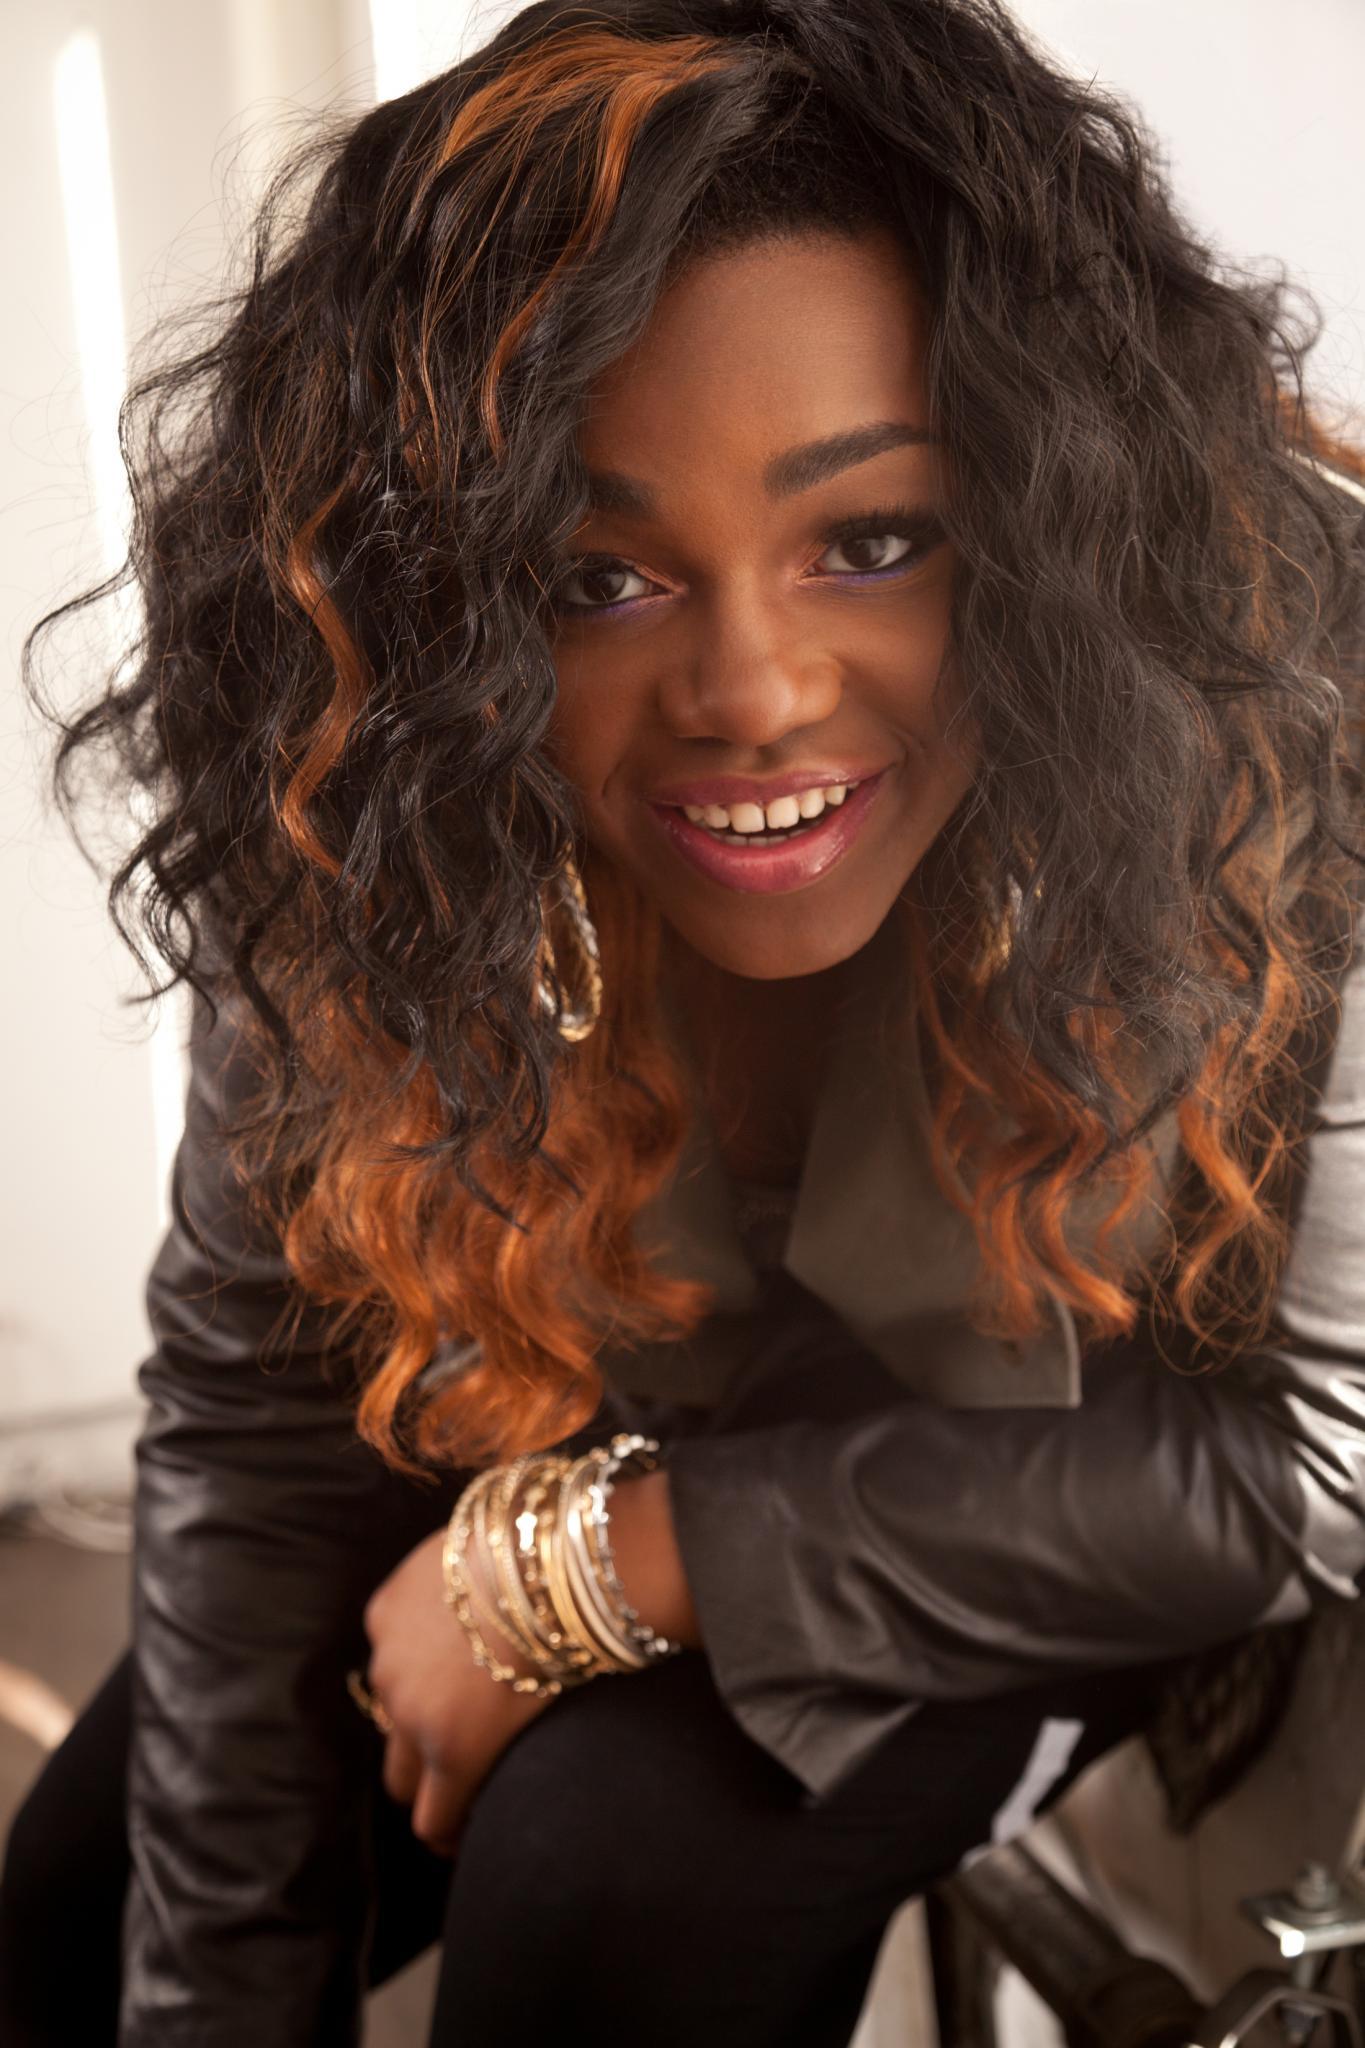 New & Next: Meet Eclectic Soul Singer Lorine Chia